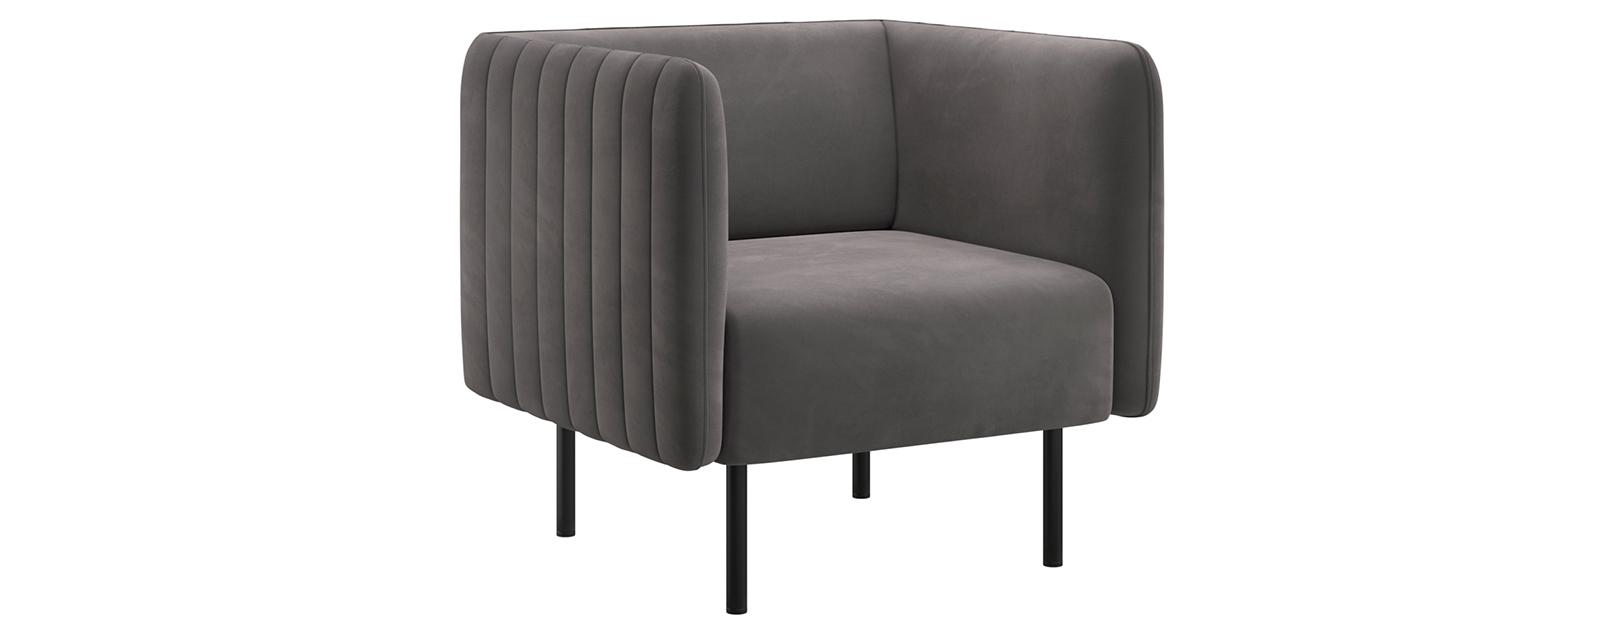 Кресло тканевое Рио Velutto тёмно-серый (Велюр)